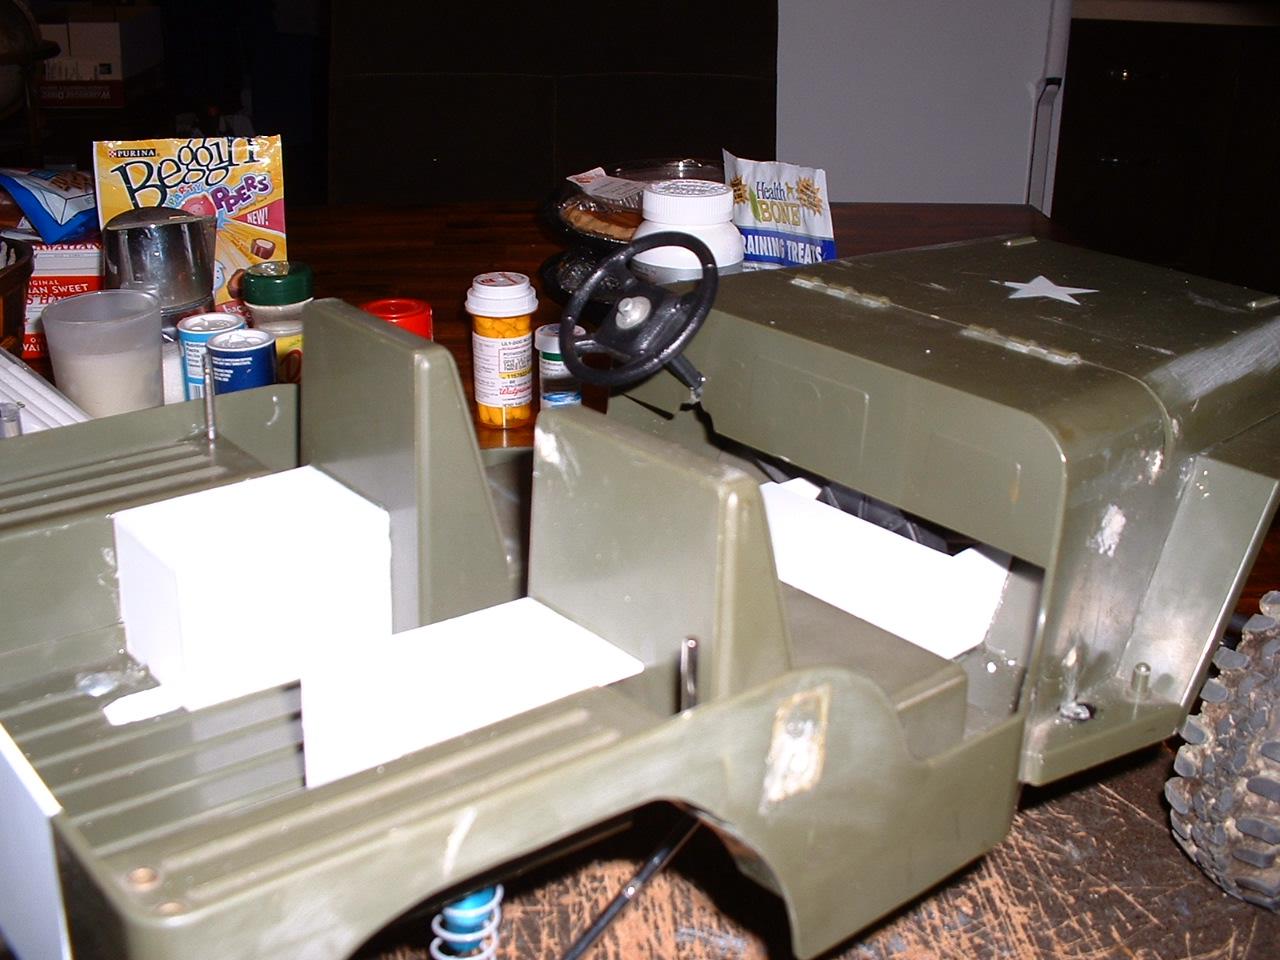 Click image for larger version  Name:G.I. Joe Jeep 6 012.JPG Views:801 Size:342.3 KB ID:2051077